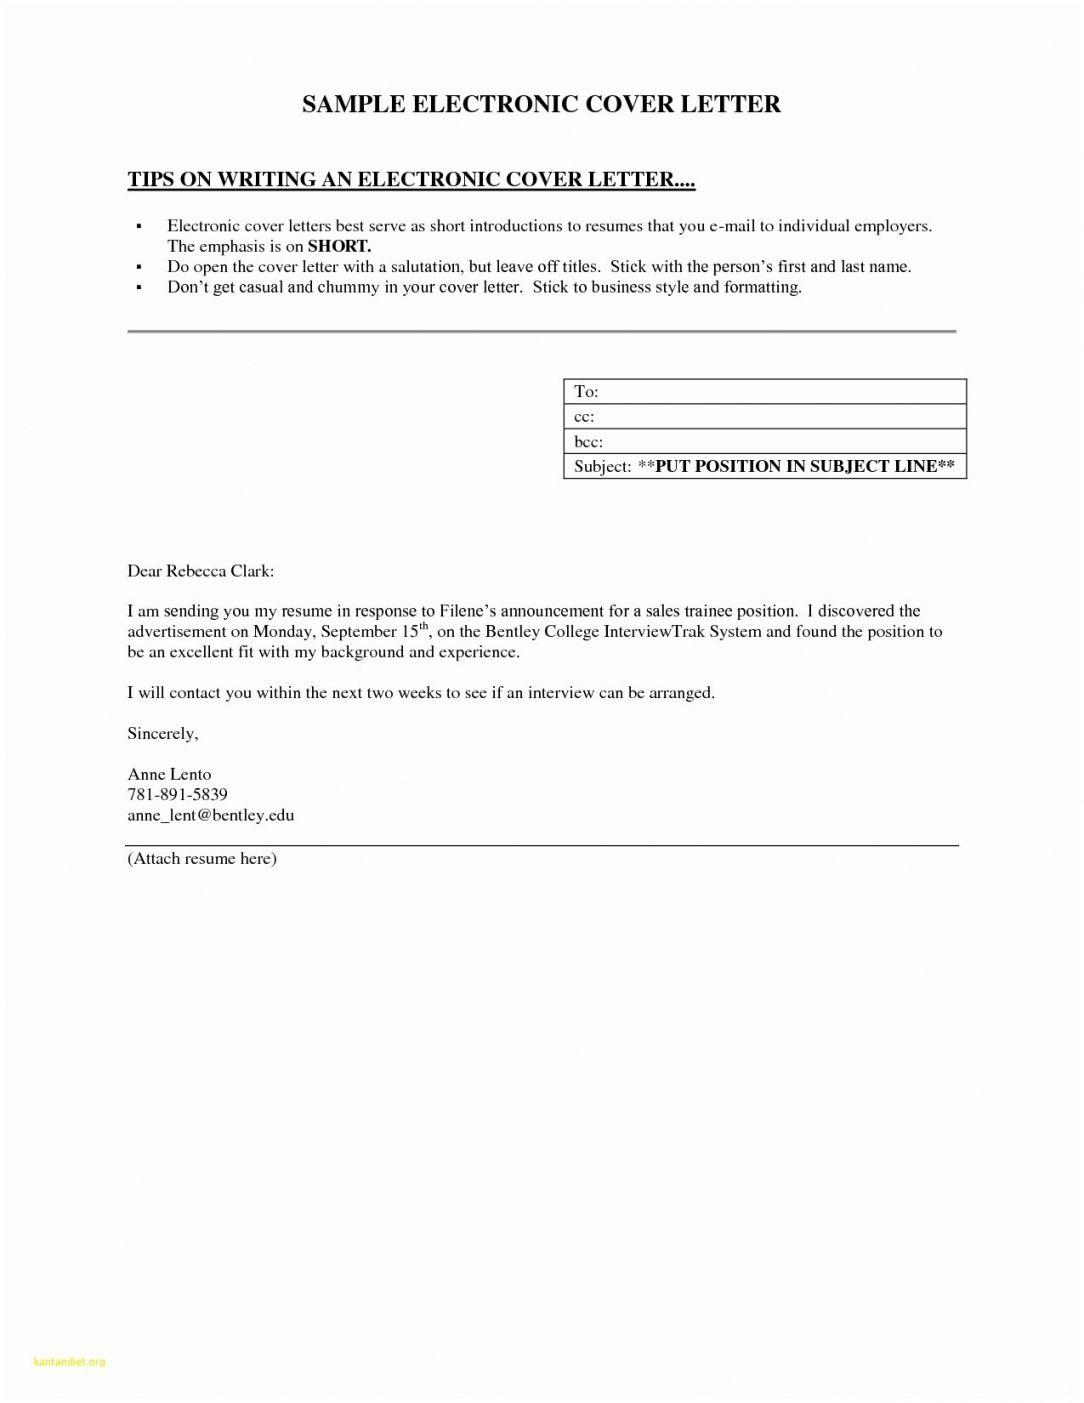 25+ Email Cover Letter . Email Cover Letter Email Letter Format